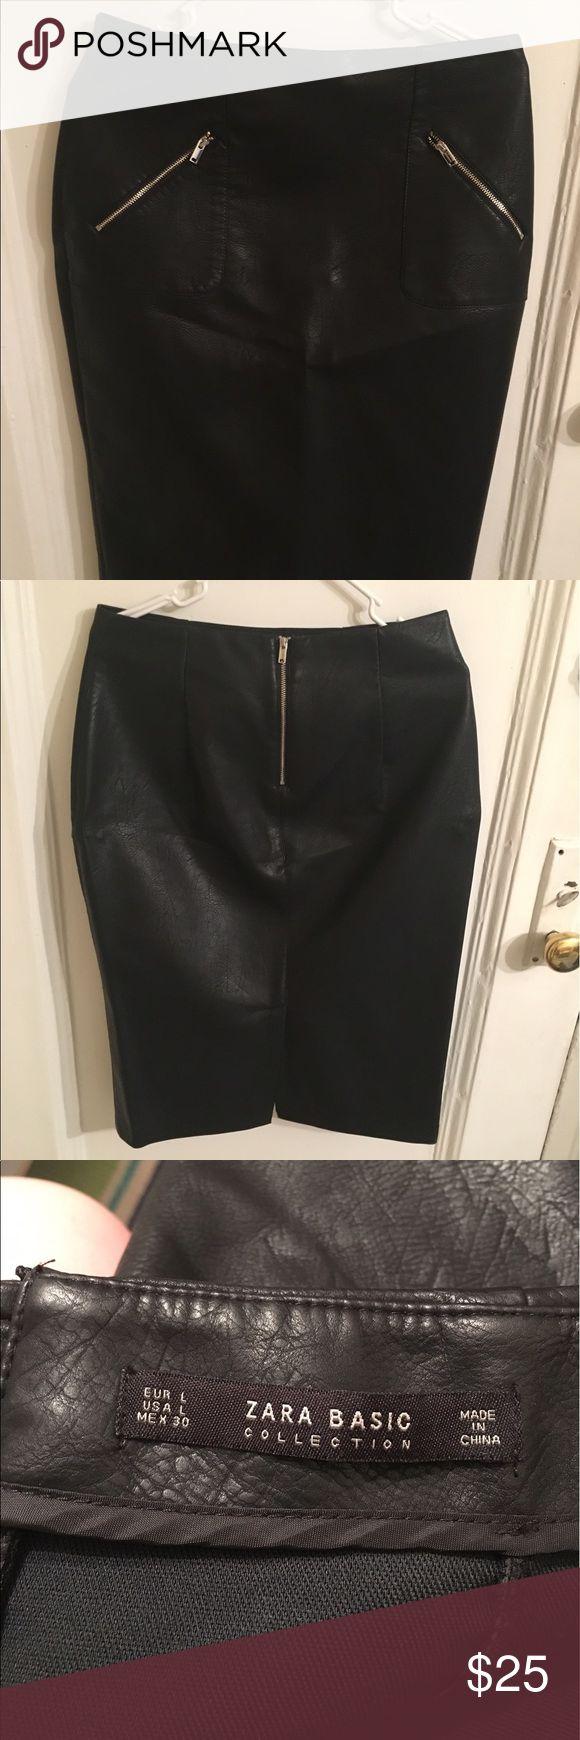 Zara black faux leather pencil skirt Beautiful black faux leather pencil skirt with zipper details Zara Skirts Pencil